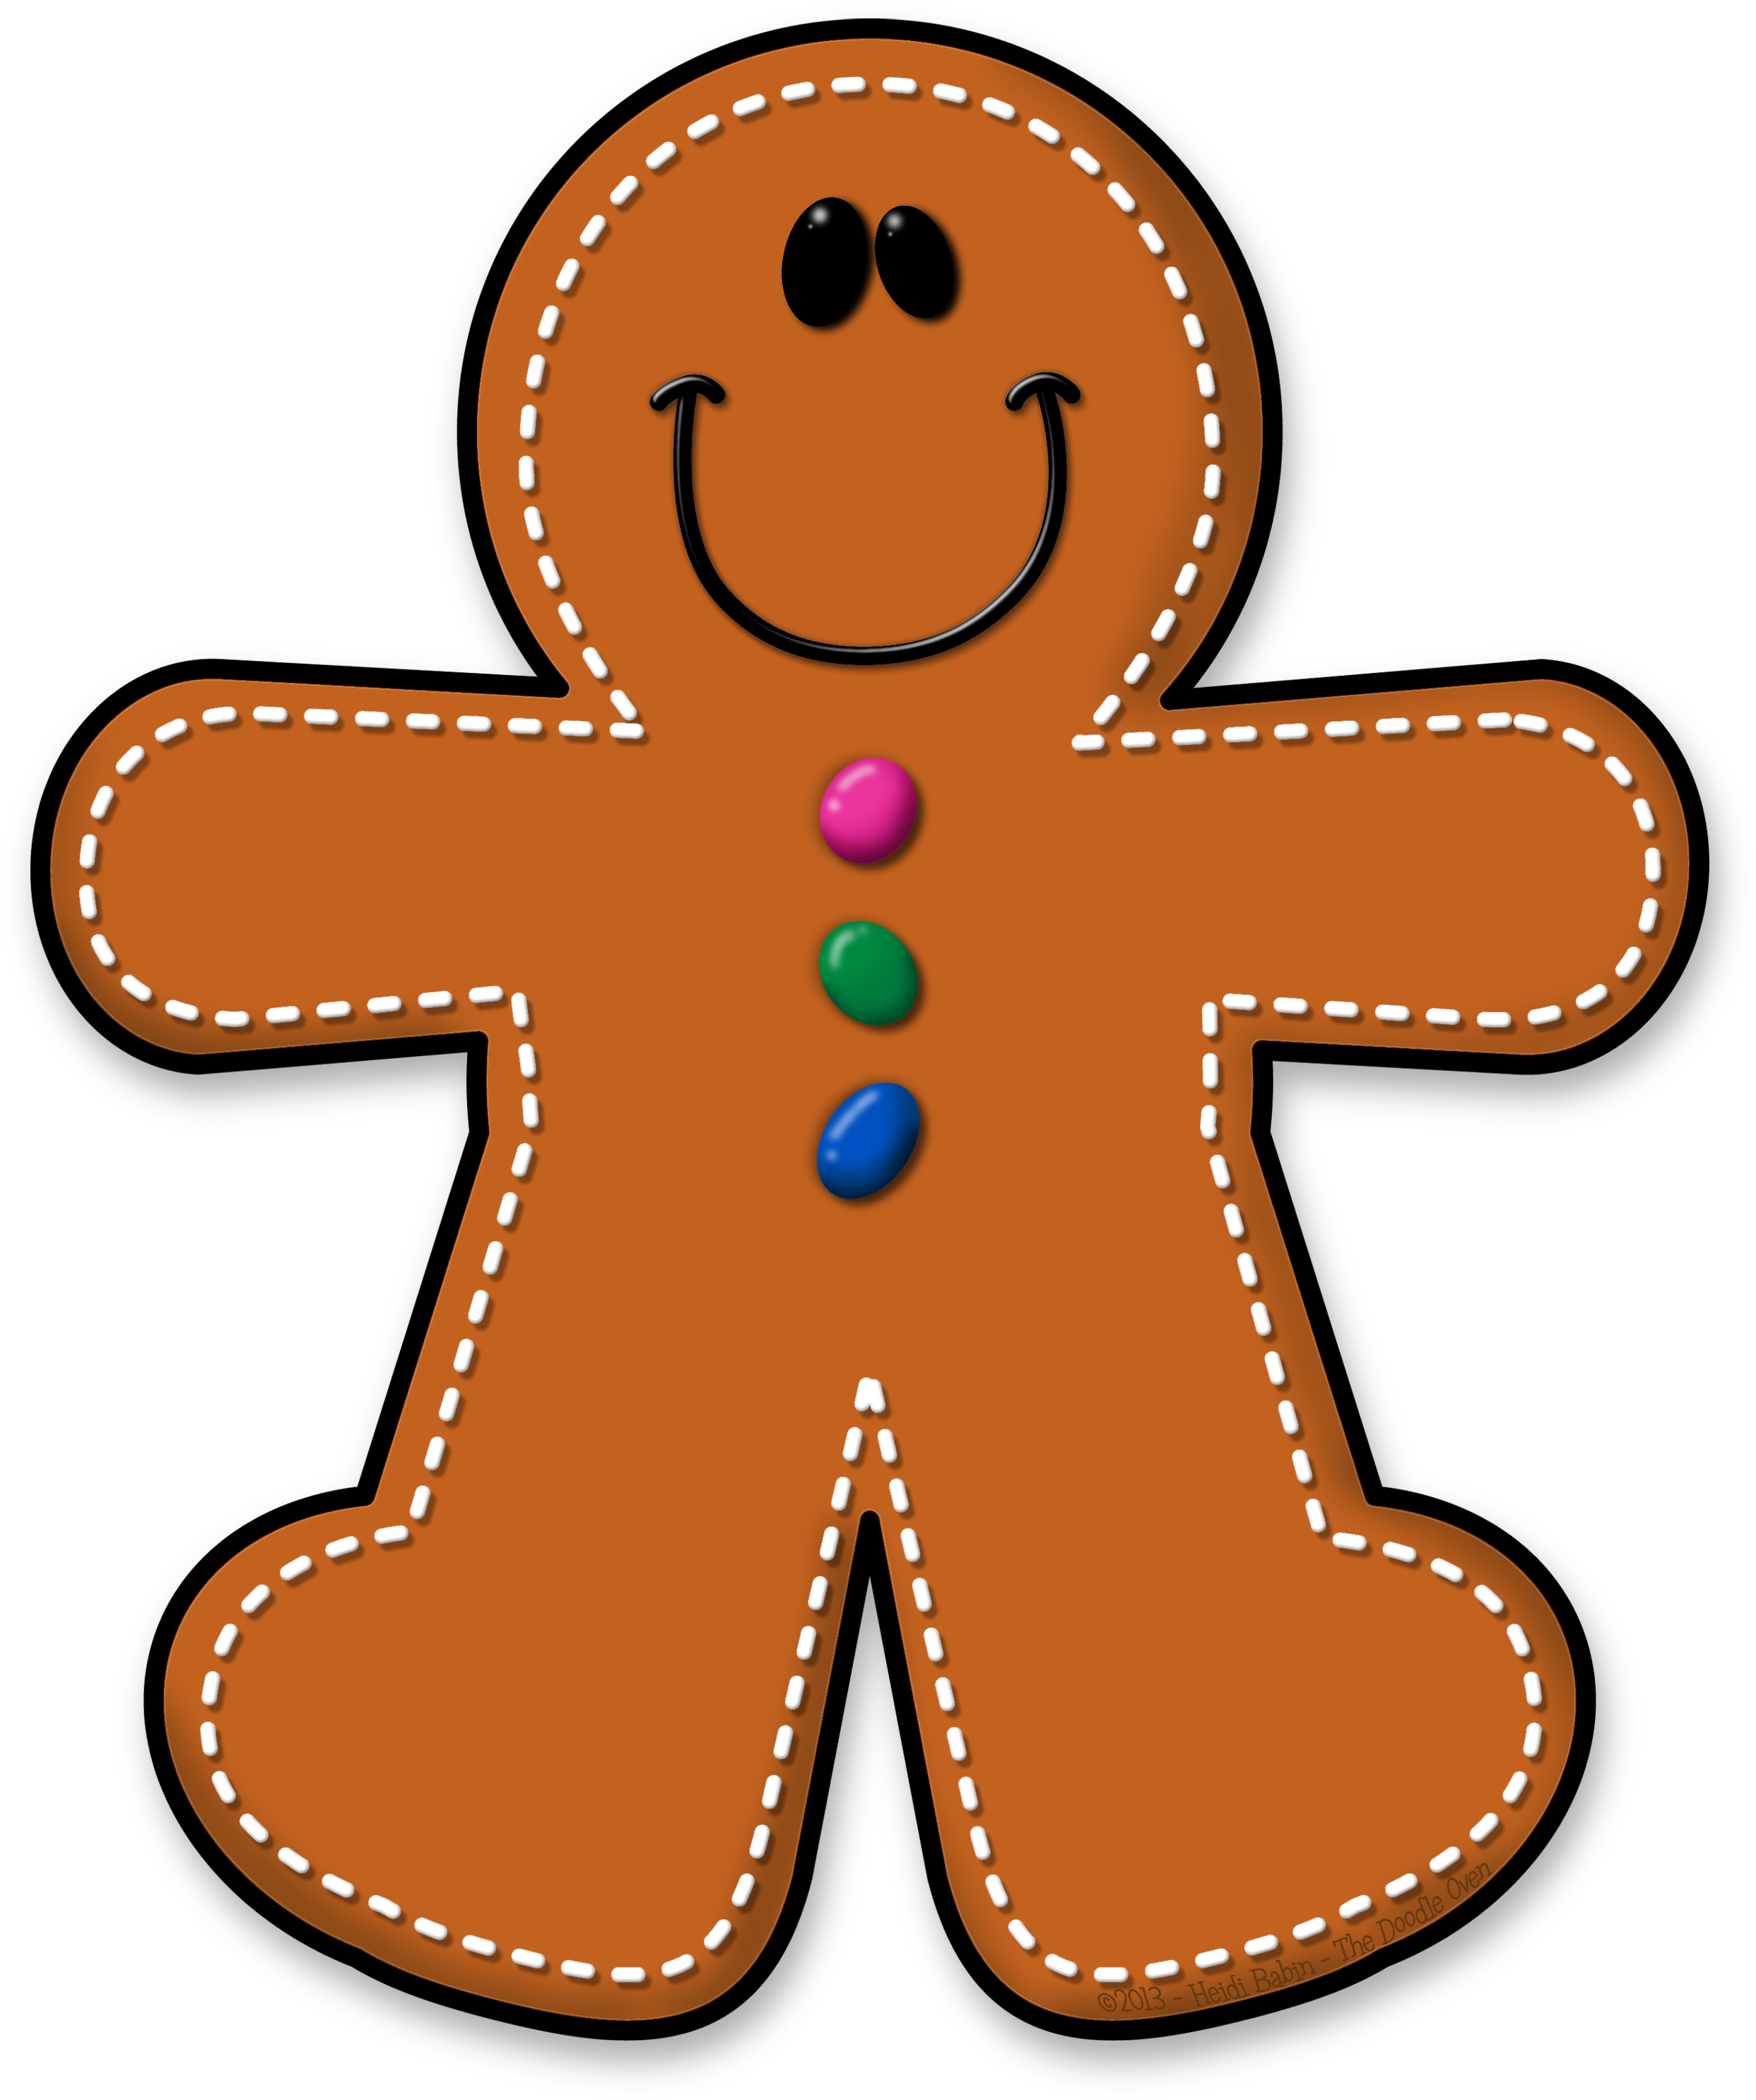 Transparent cute gingerbread man clipart - ✿**✿*ginger*✿**✿ - Clipart Gingerbread Man